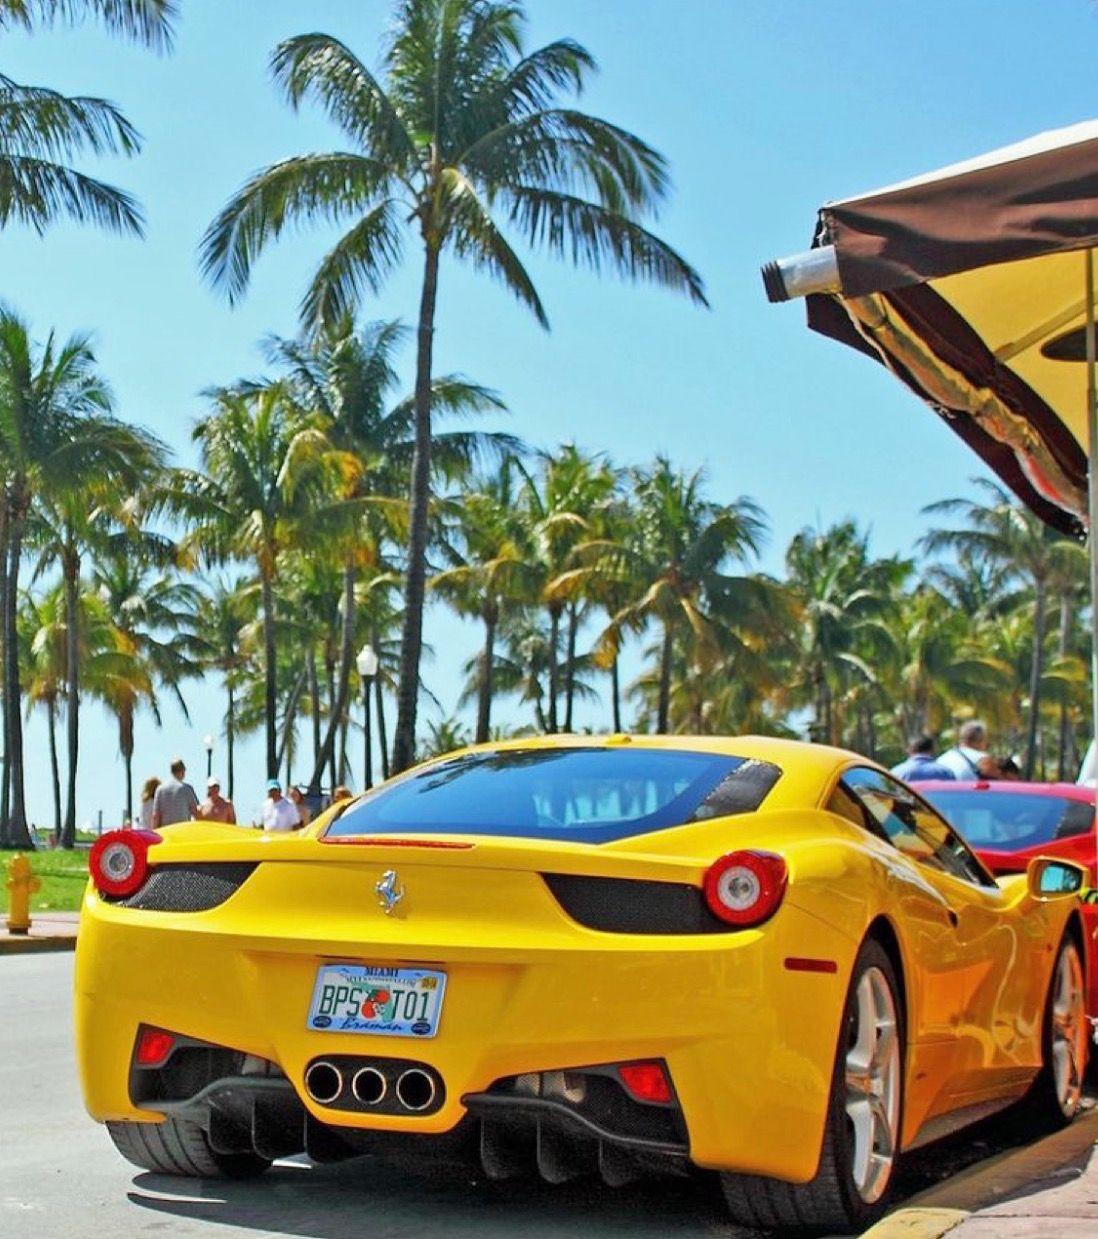 Miami Beach Luxury Car Rentals Www Billionaire Listings Com Best Luxury Cars Sport Cars Ferrari 458